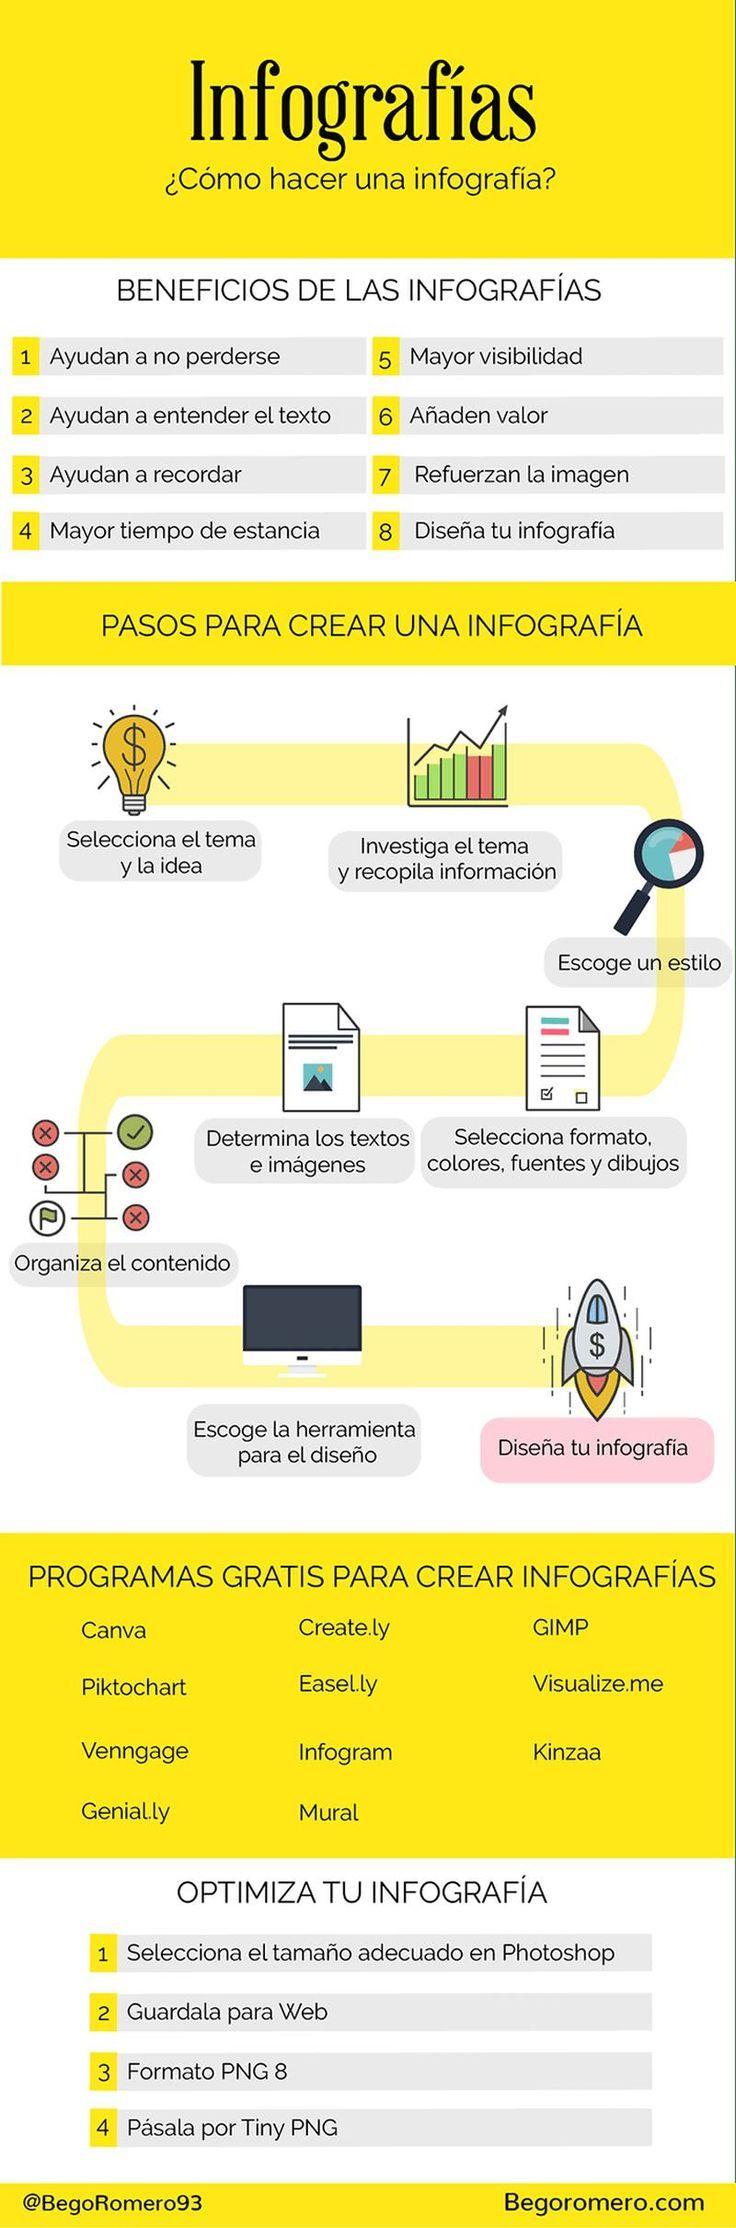 Psychology-Infographic-Por-que-hacer-Infografias-para-tu-blog Psychology Infographic : Por qué hacer Infografías para tu blog y cómo hacerlas